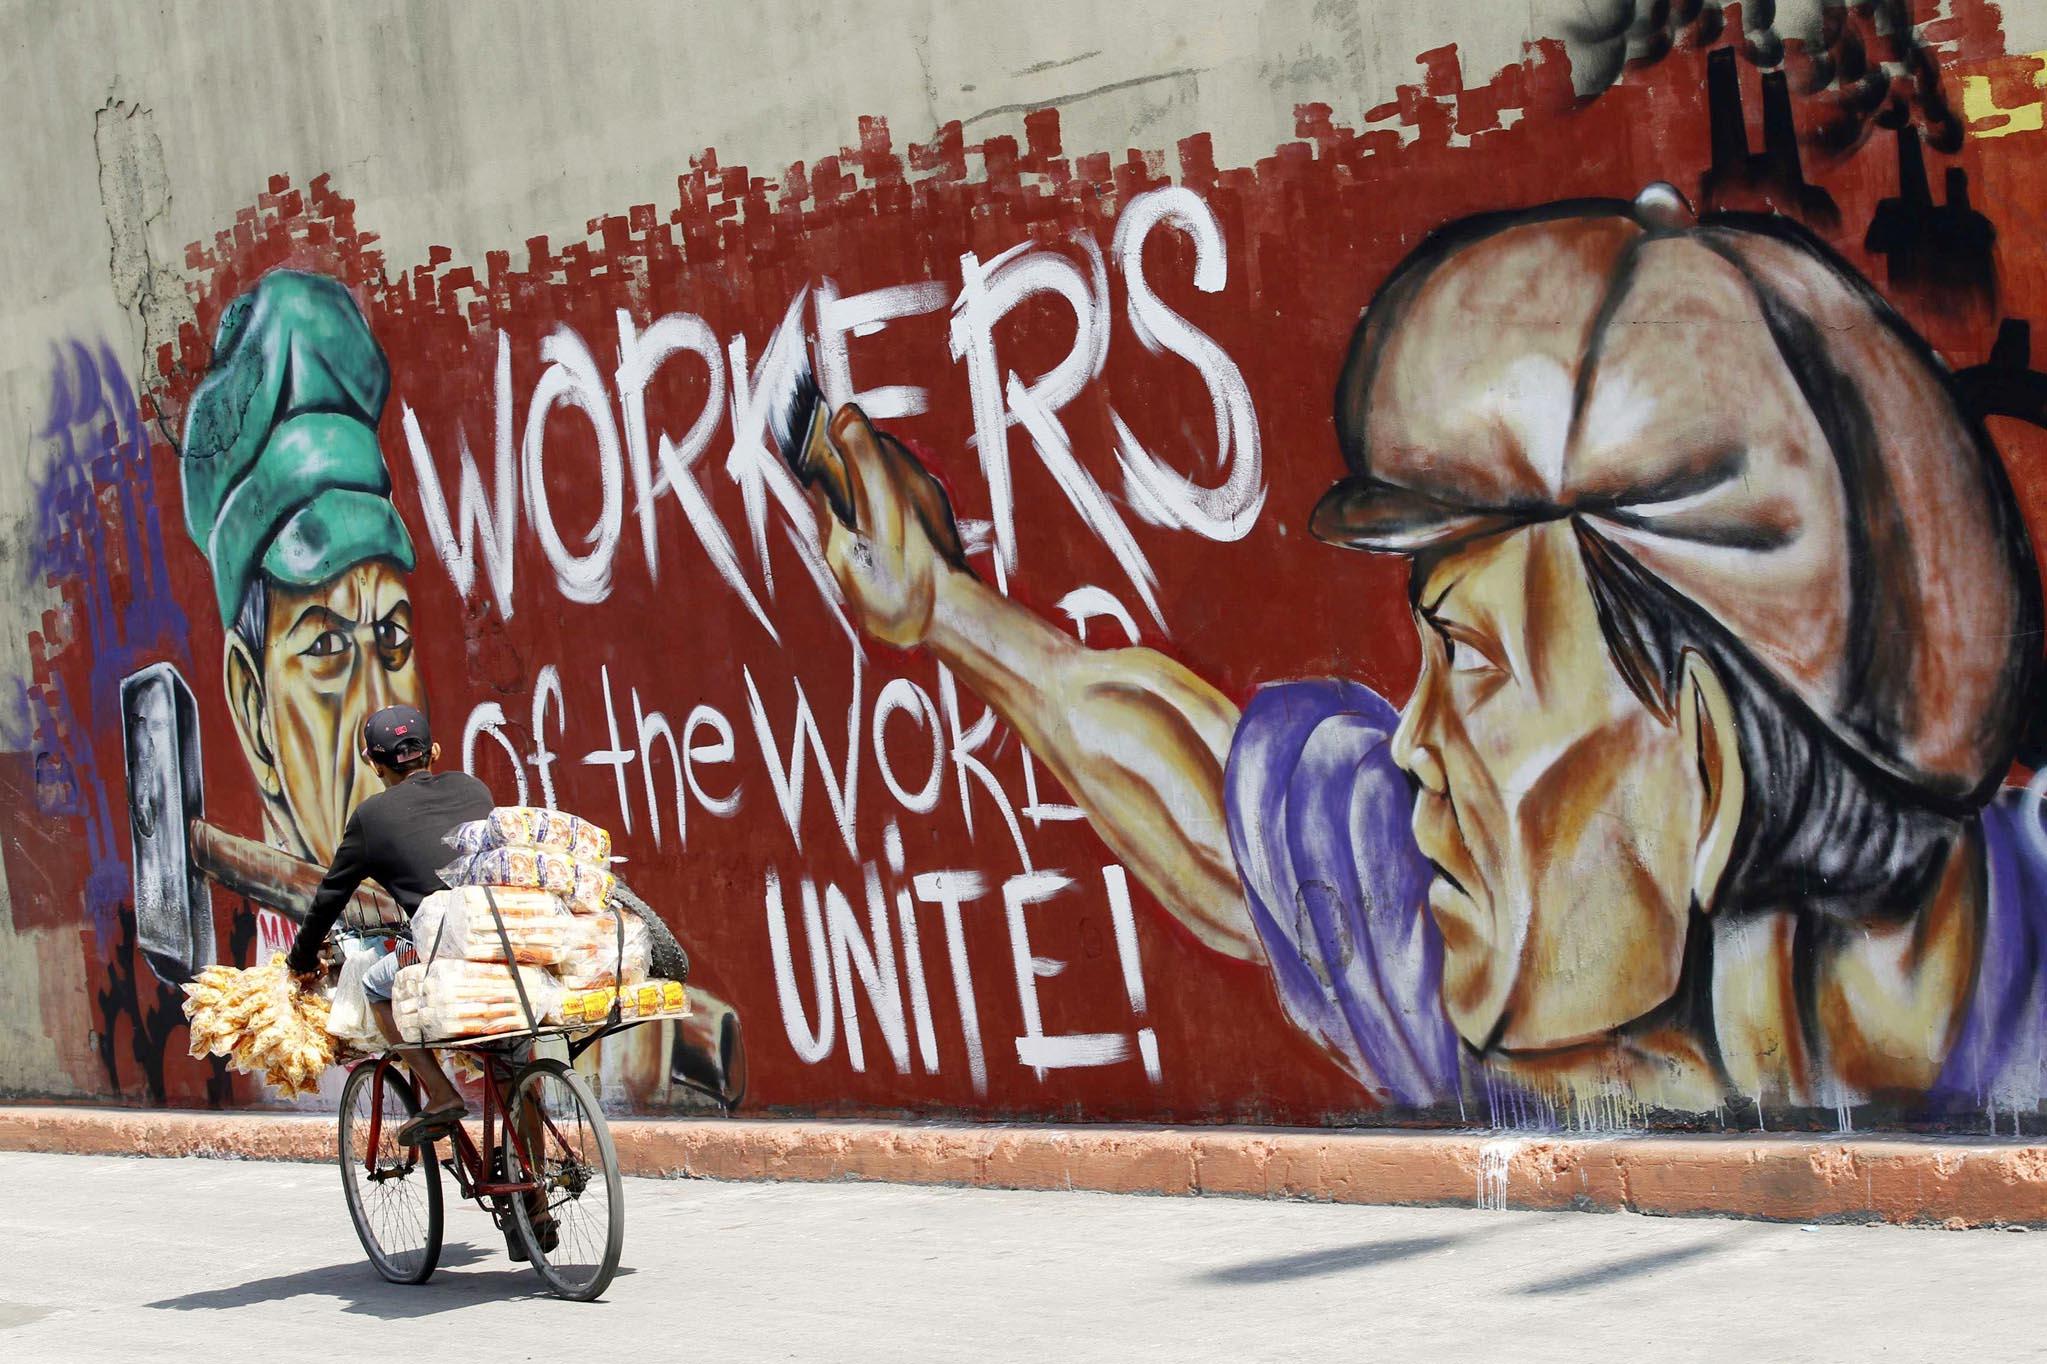 A man peddling food rides his bicycle past a graffiti along a street in Manila